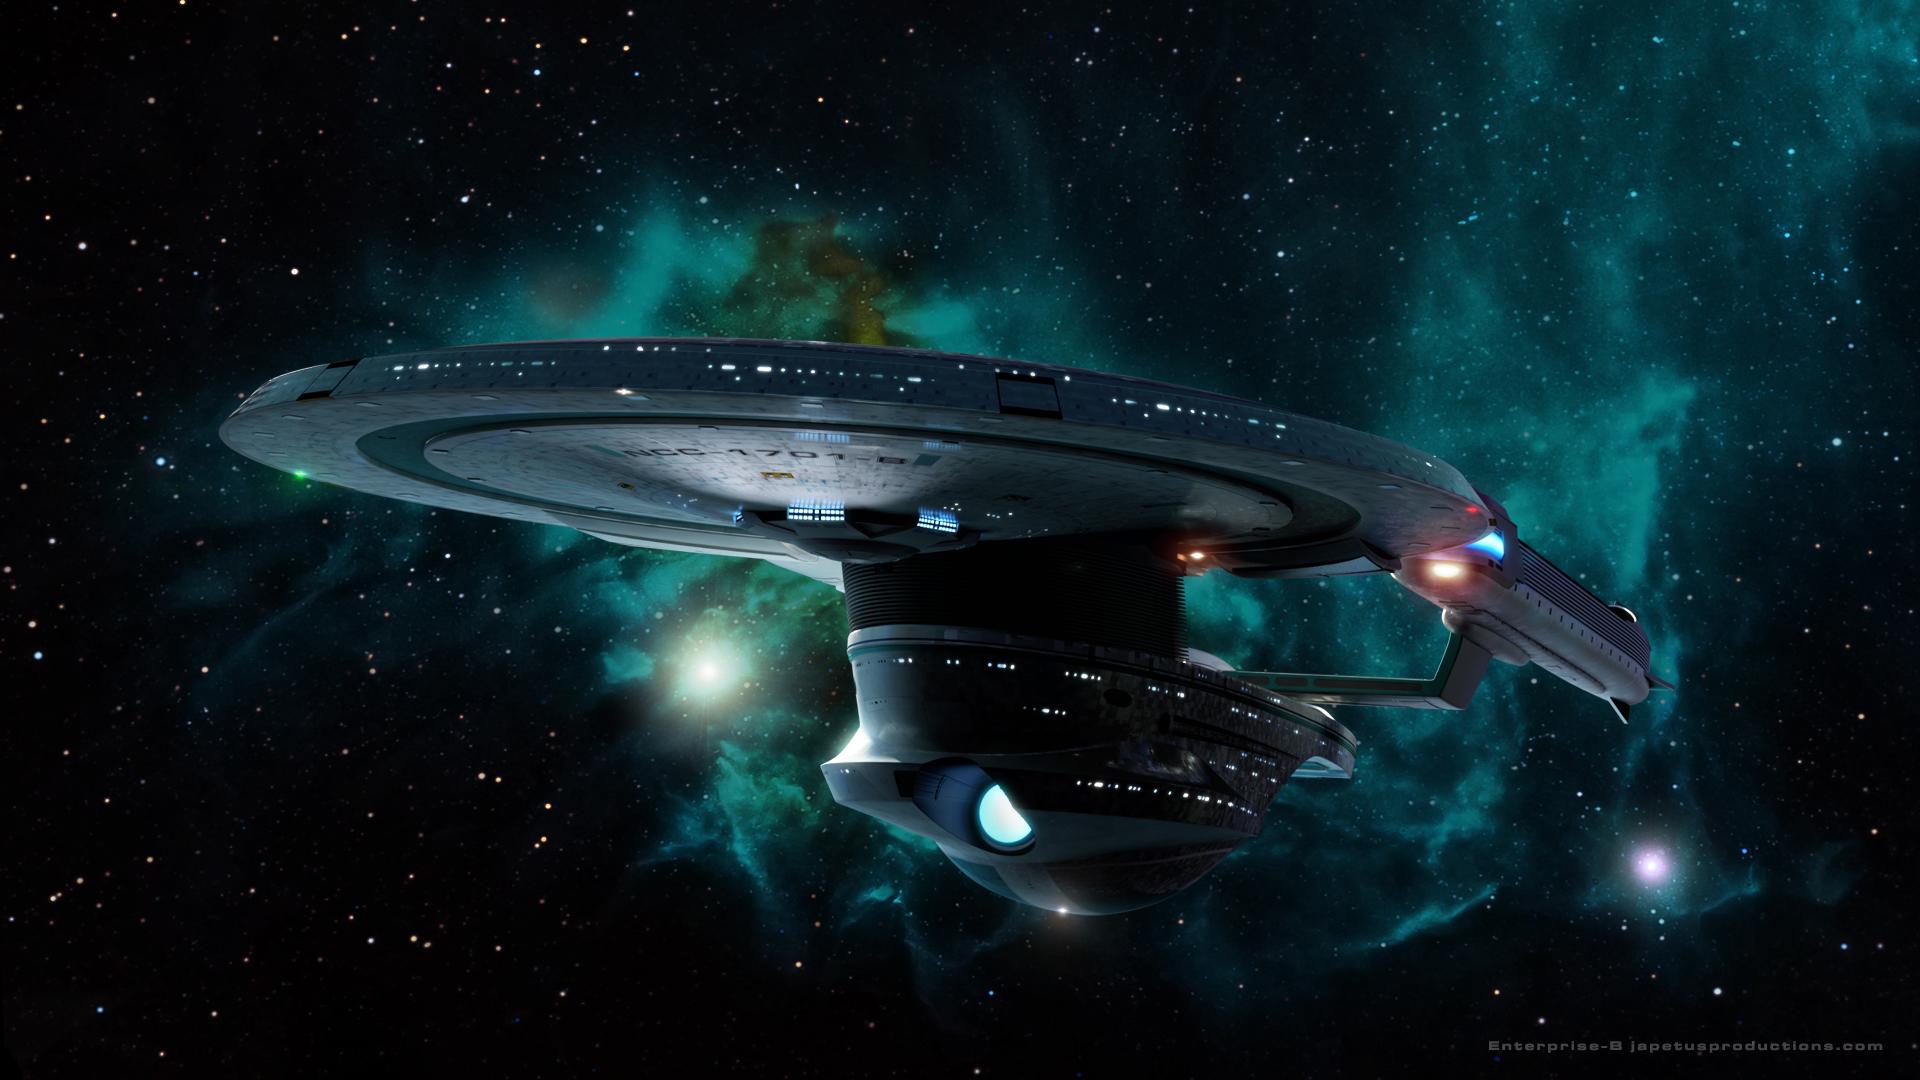 Star Trek Starship Enterprise Spaceship Stars Nebula wallpaper 1920x1080